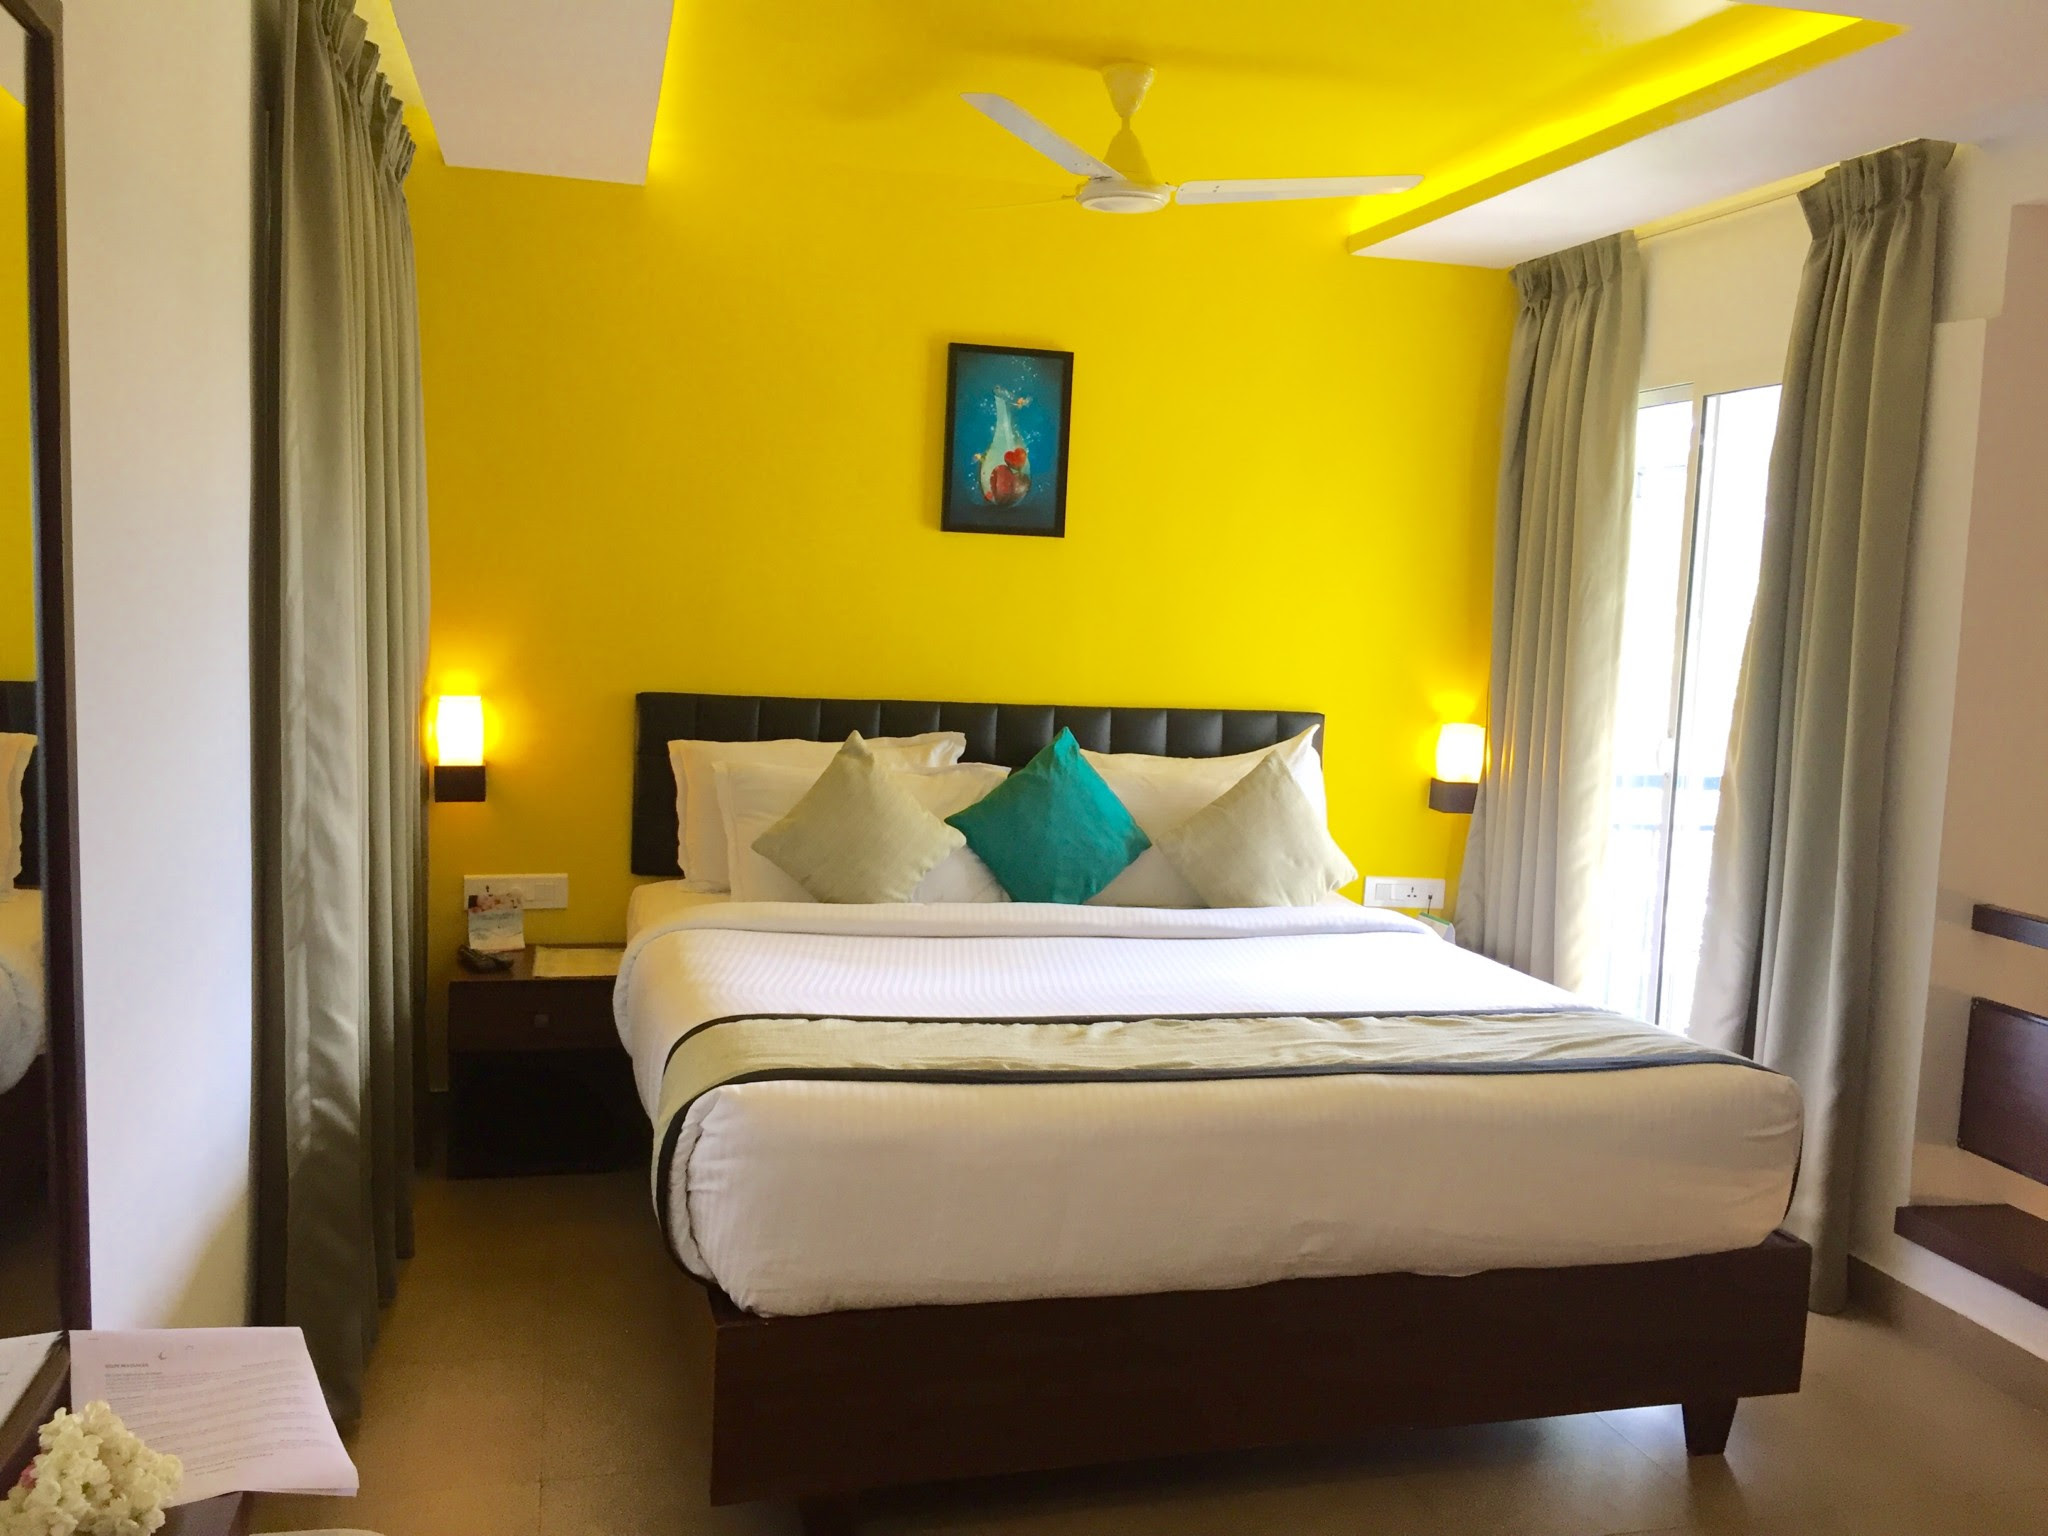 Bedroom inside-Munnar Tea Country resort-Munnar-KaynatKazi Photography-2016